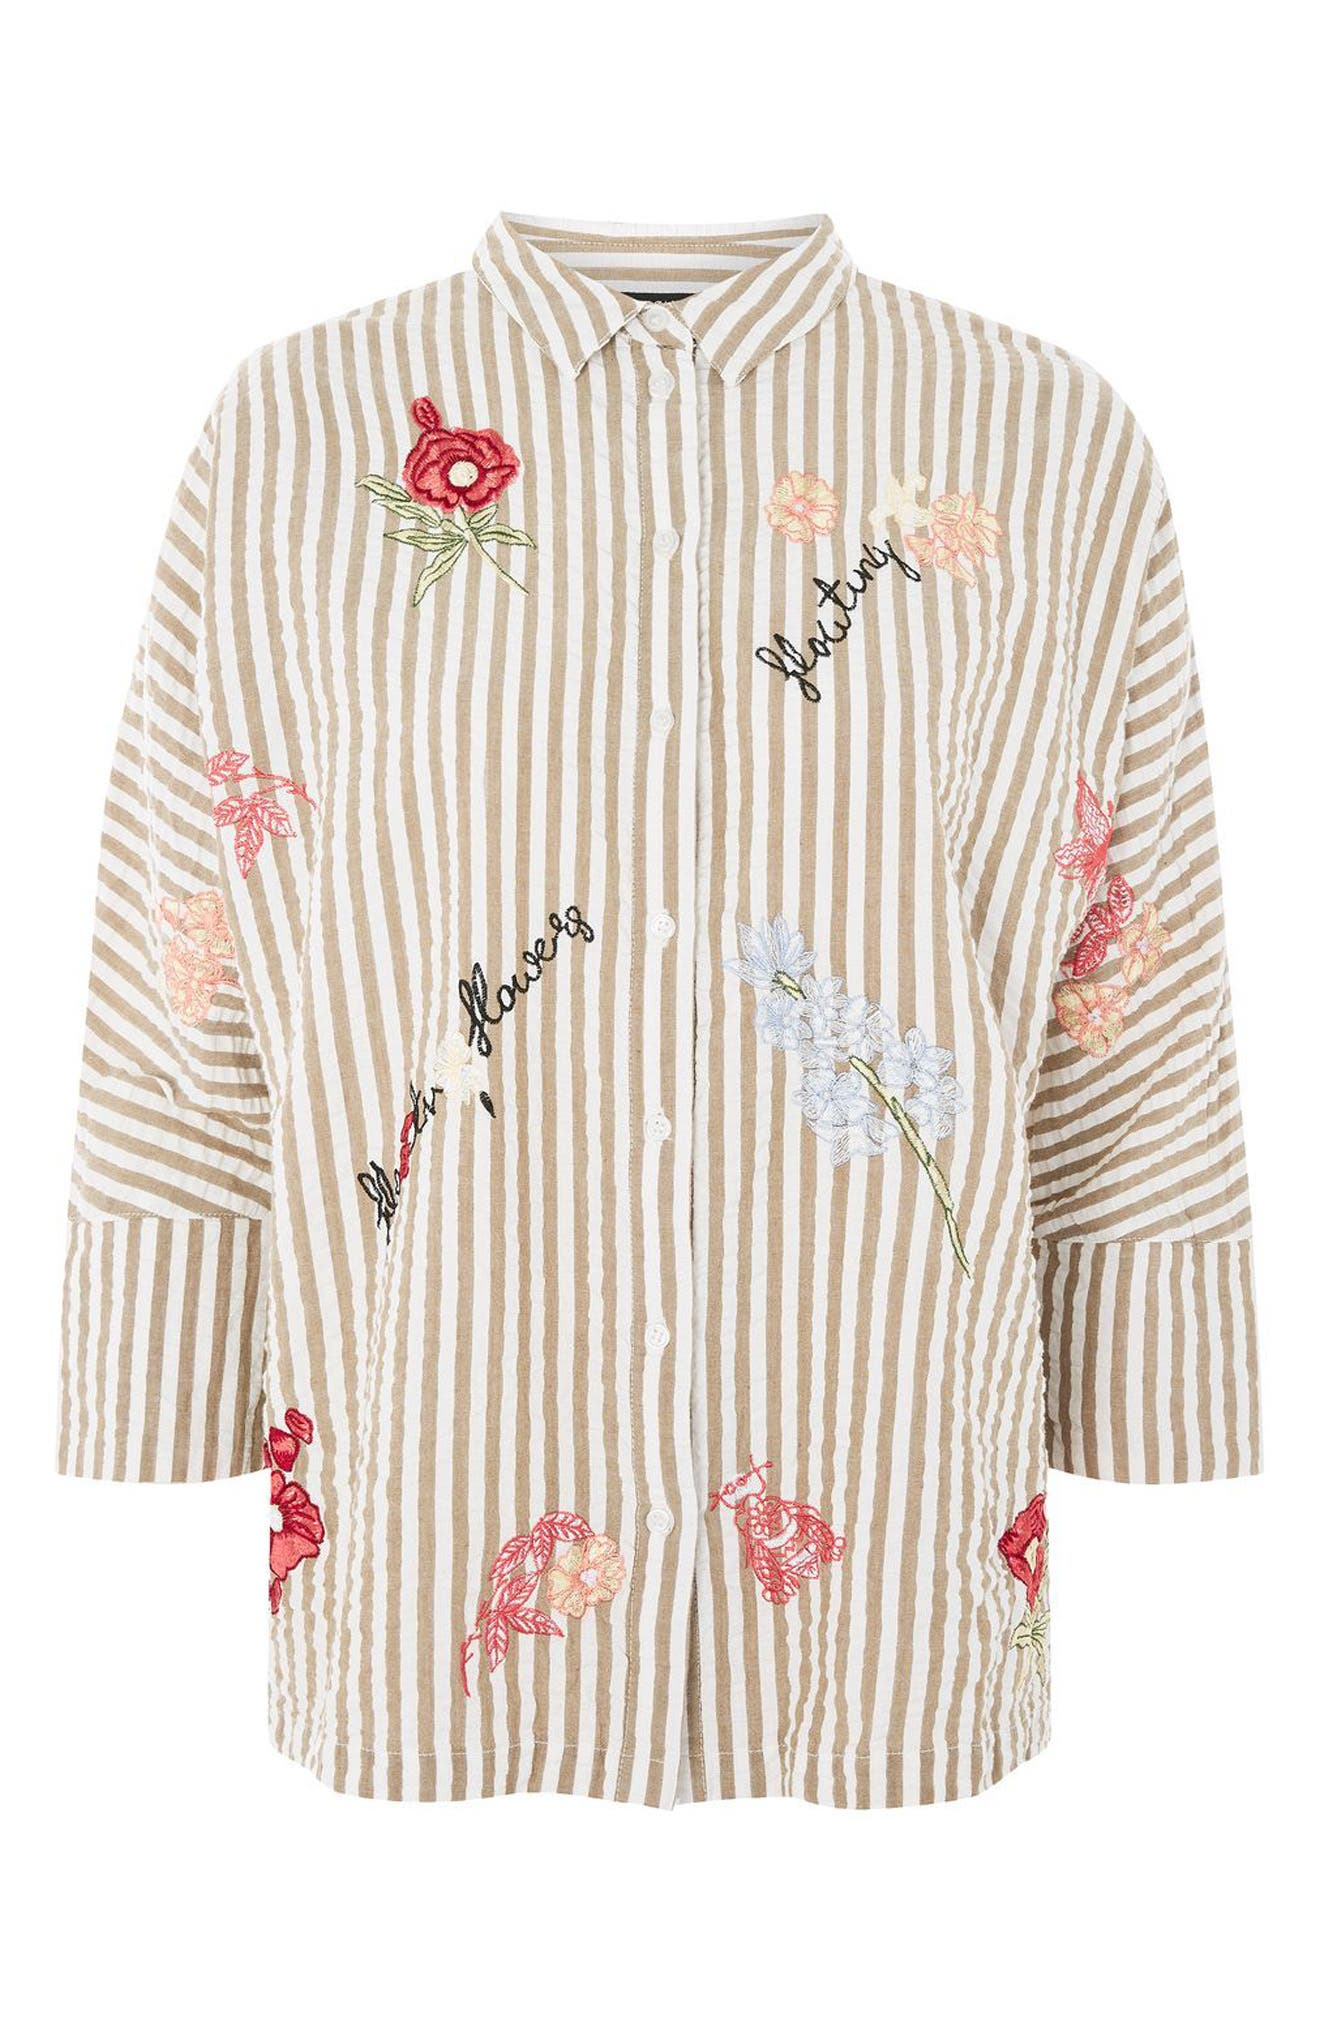 Topshop Embroidered Seersucker Shirt